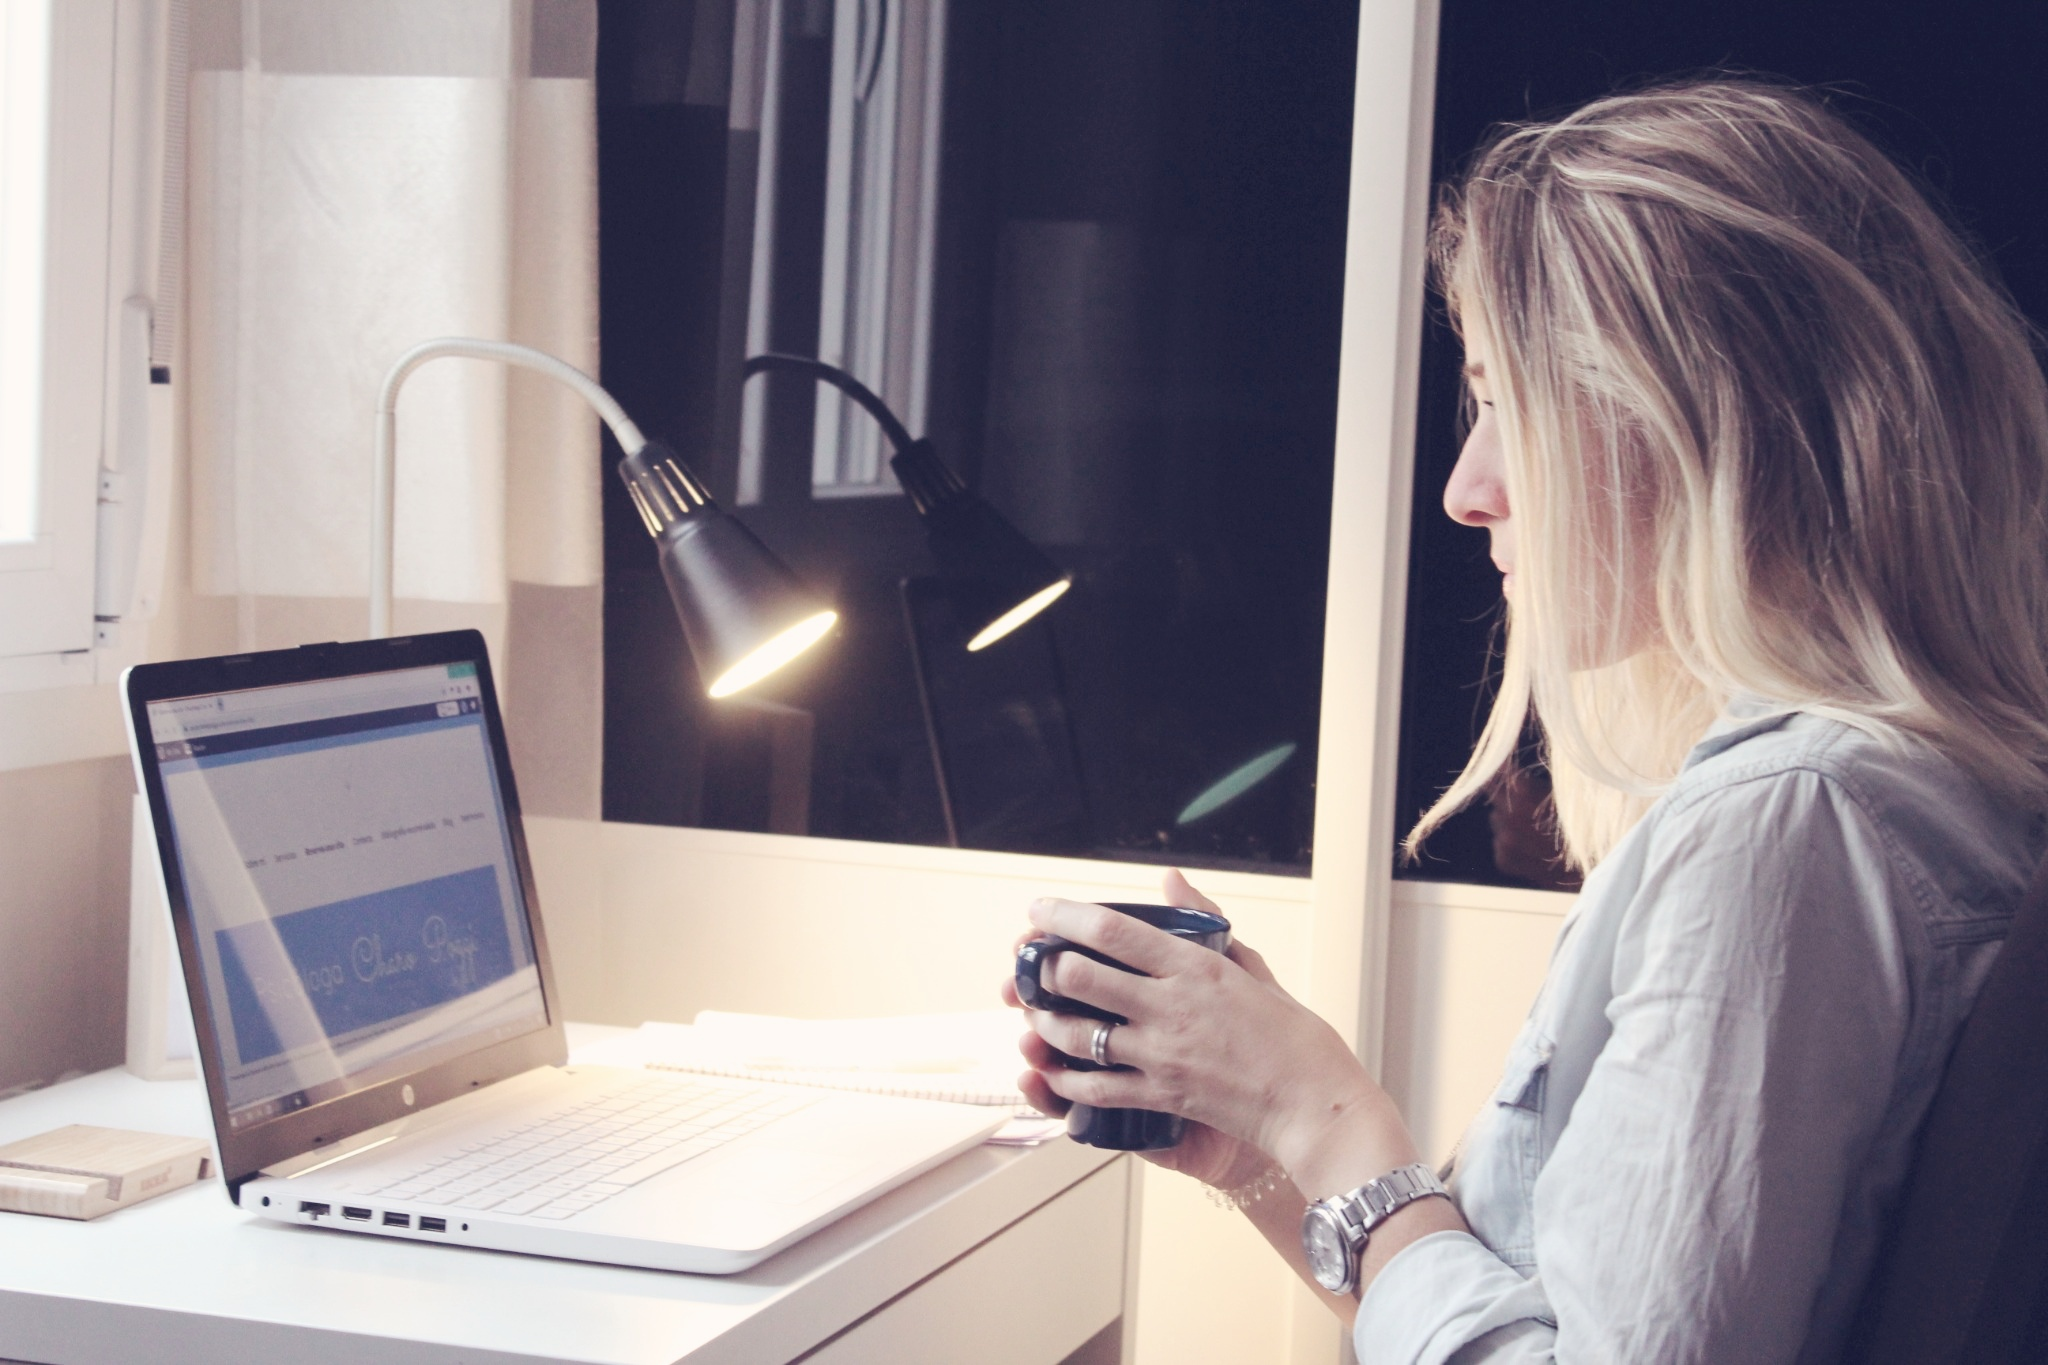 La Psicóloga Charo Poggi, mujer joven rubia, sentada mientras sostiene una taza con ambas manos, mira hacia la pantalla de su portatil donde se ve la web de psicocharopoggi.com